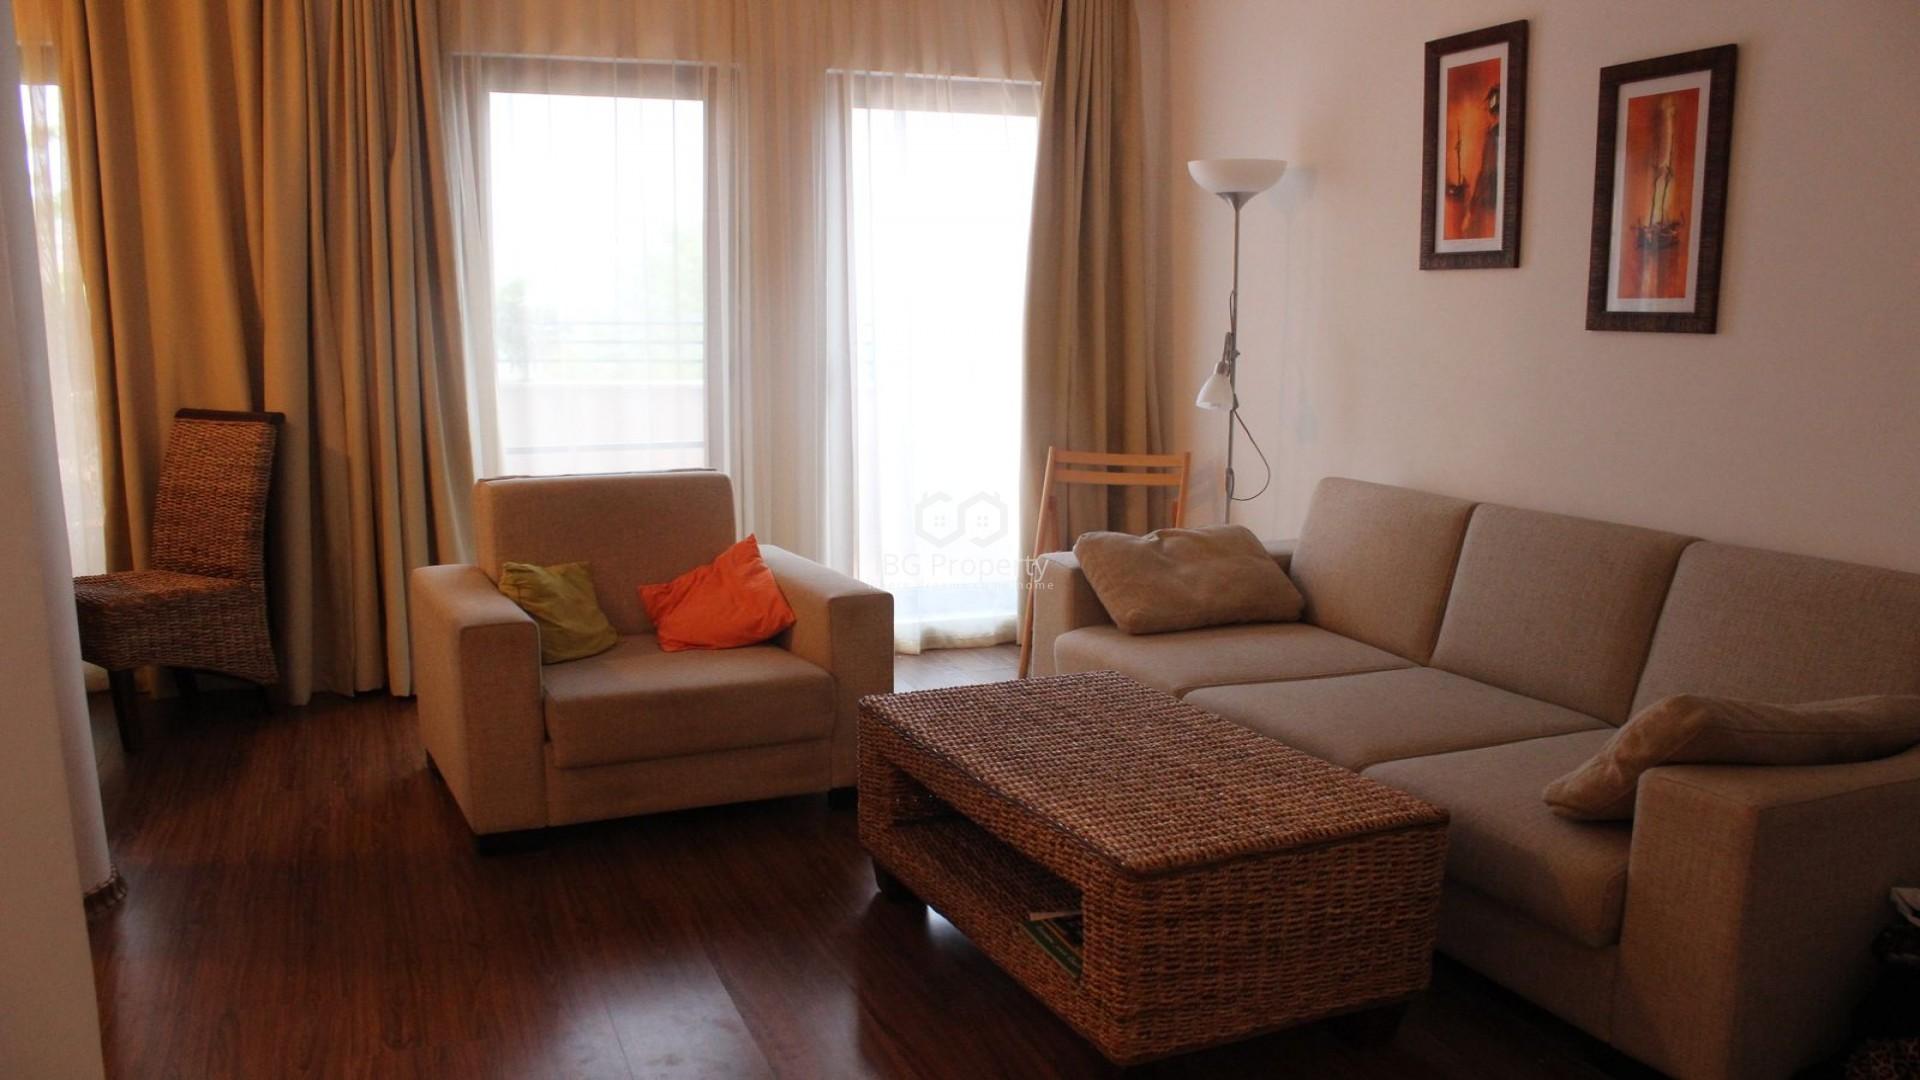 Dreizimmerwohnung in Akheloy 91 m2